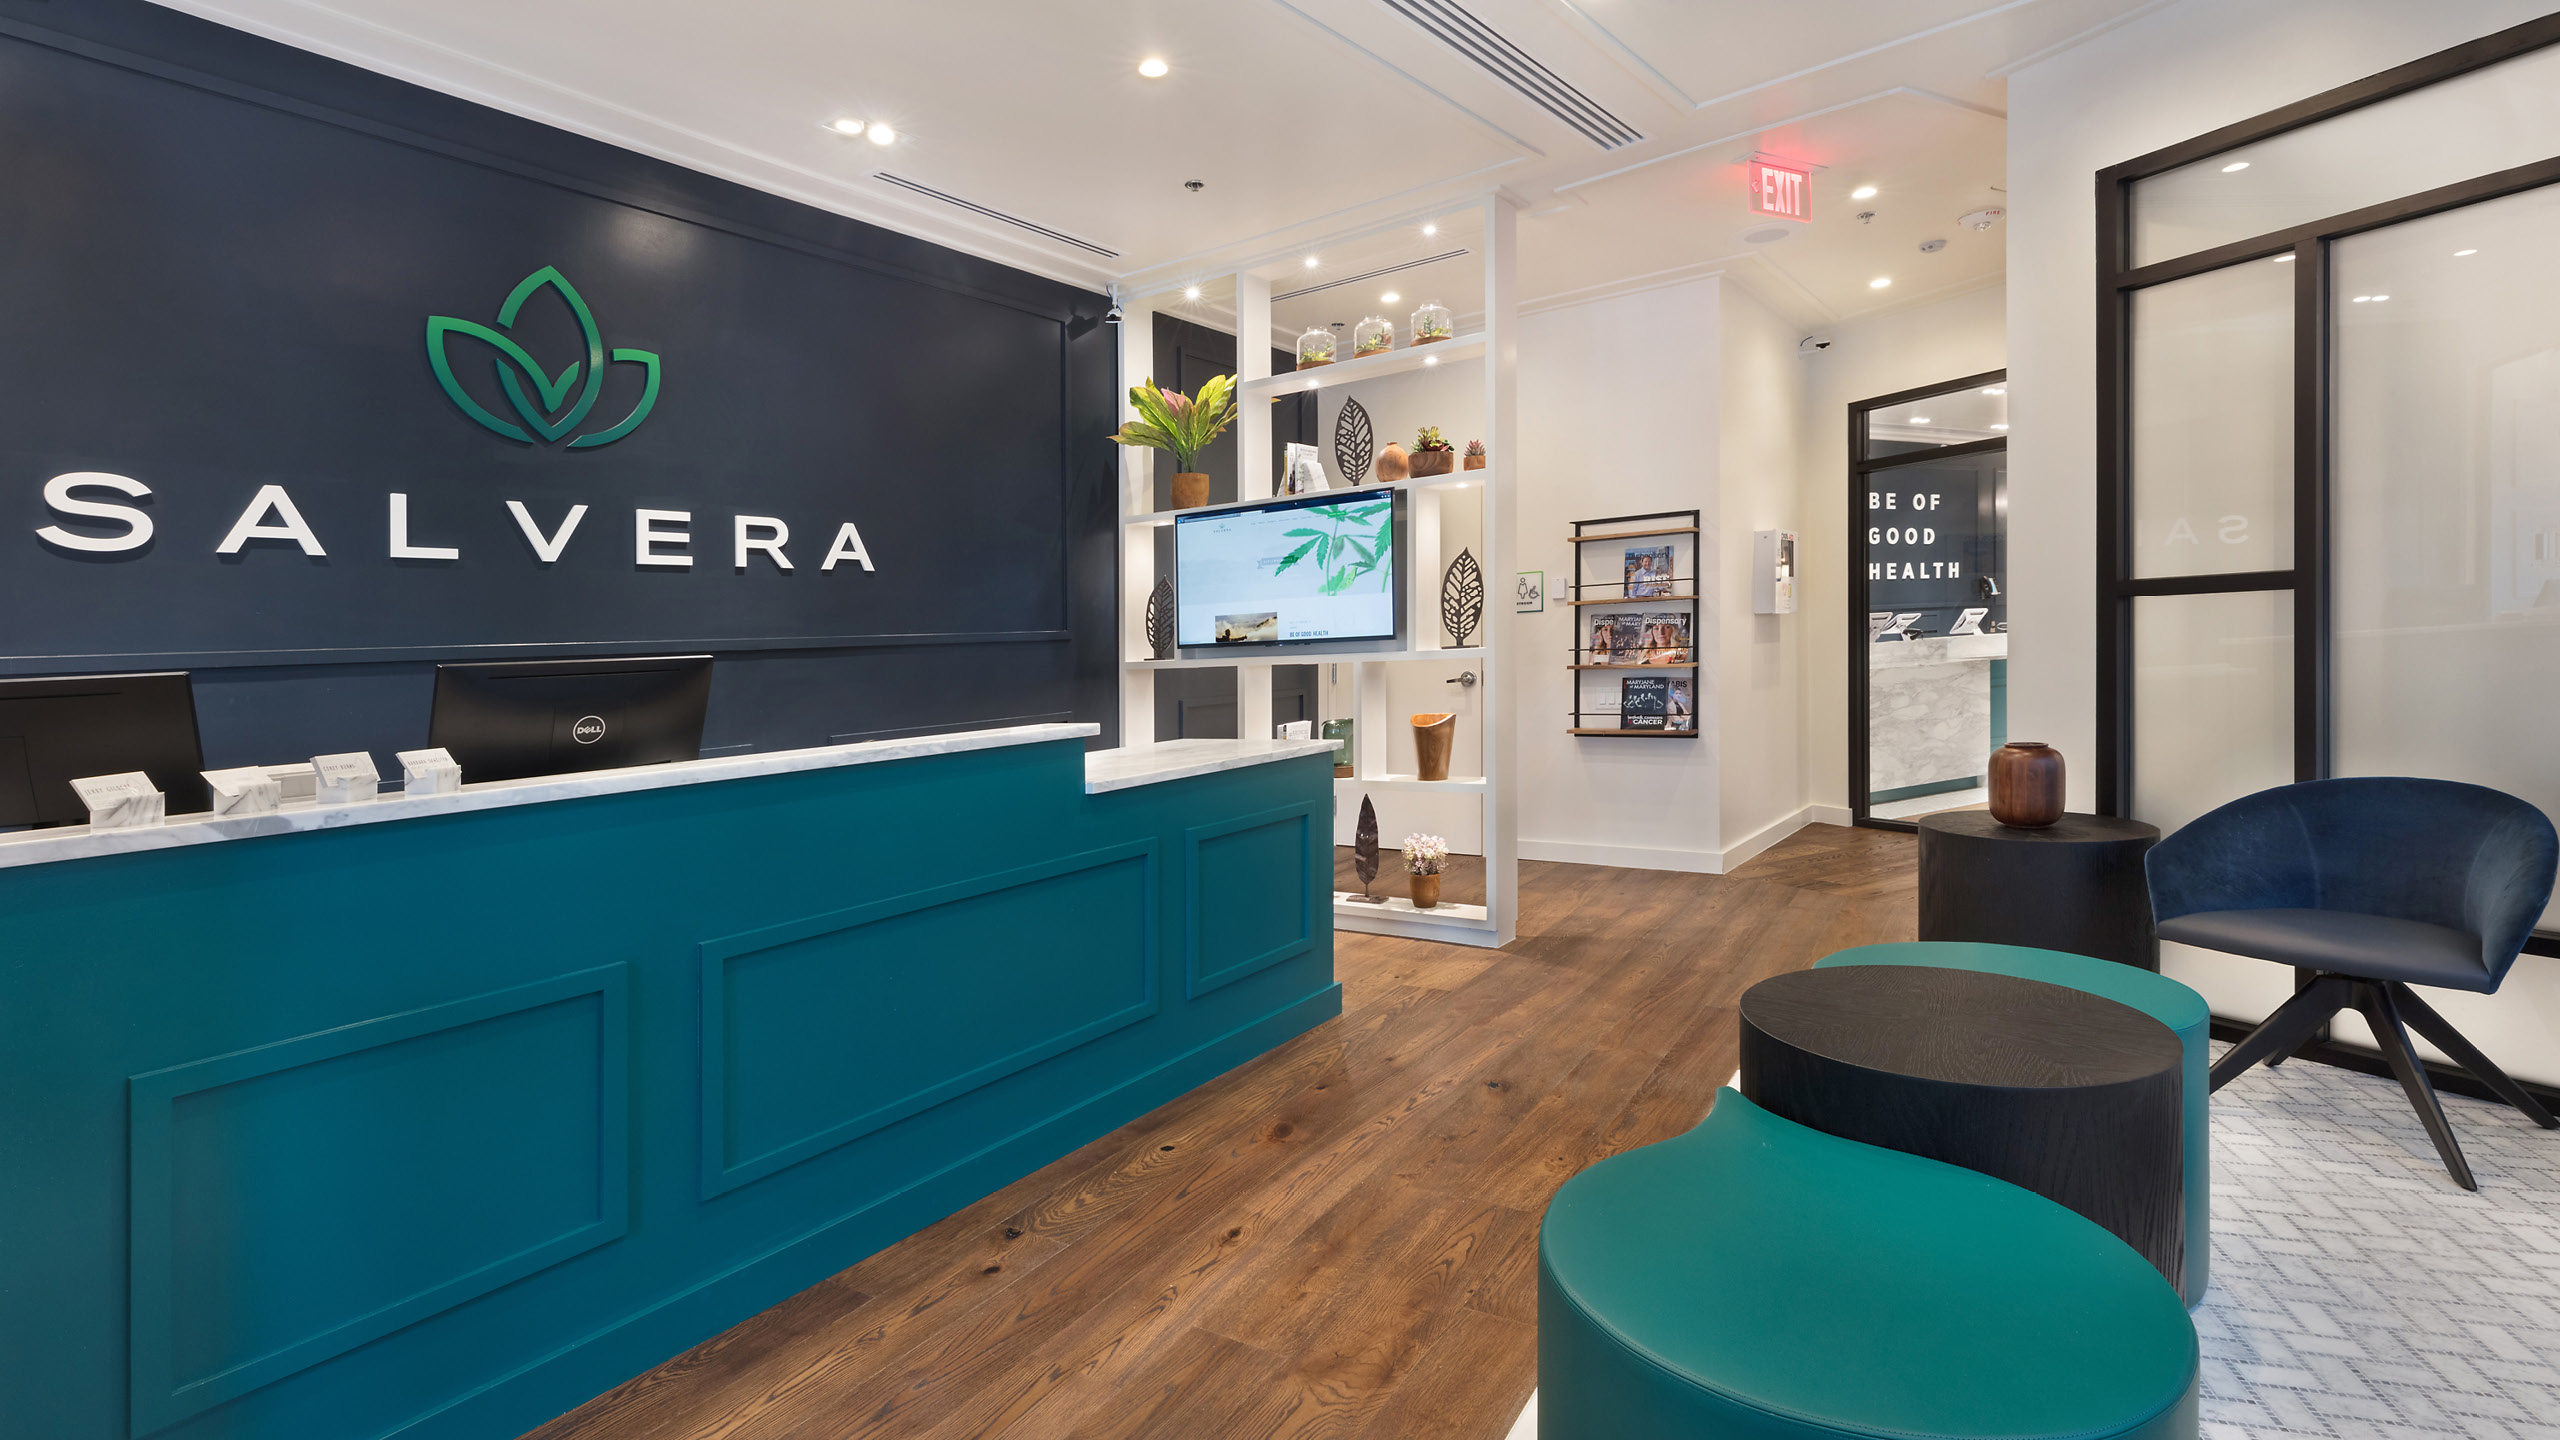 Salvera Signature Brand Elements by High Road Design Studio